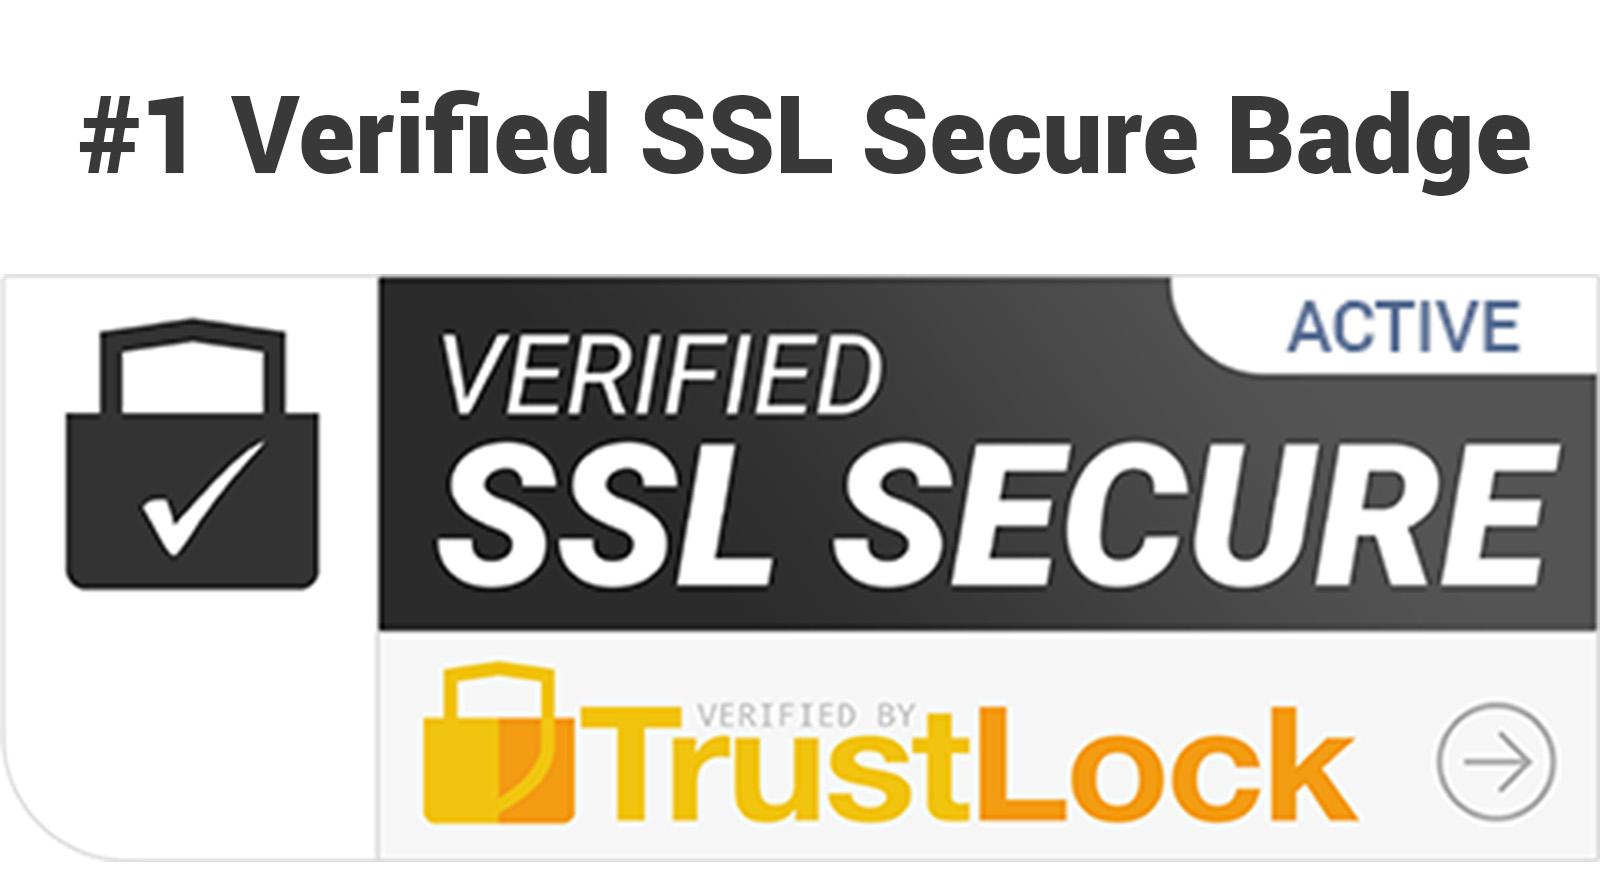 Verified SSL Secure Trust Badge - Trust Lock